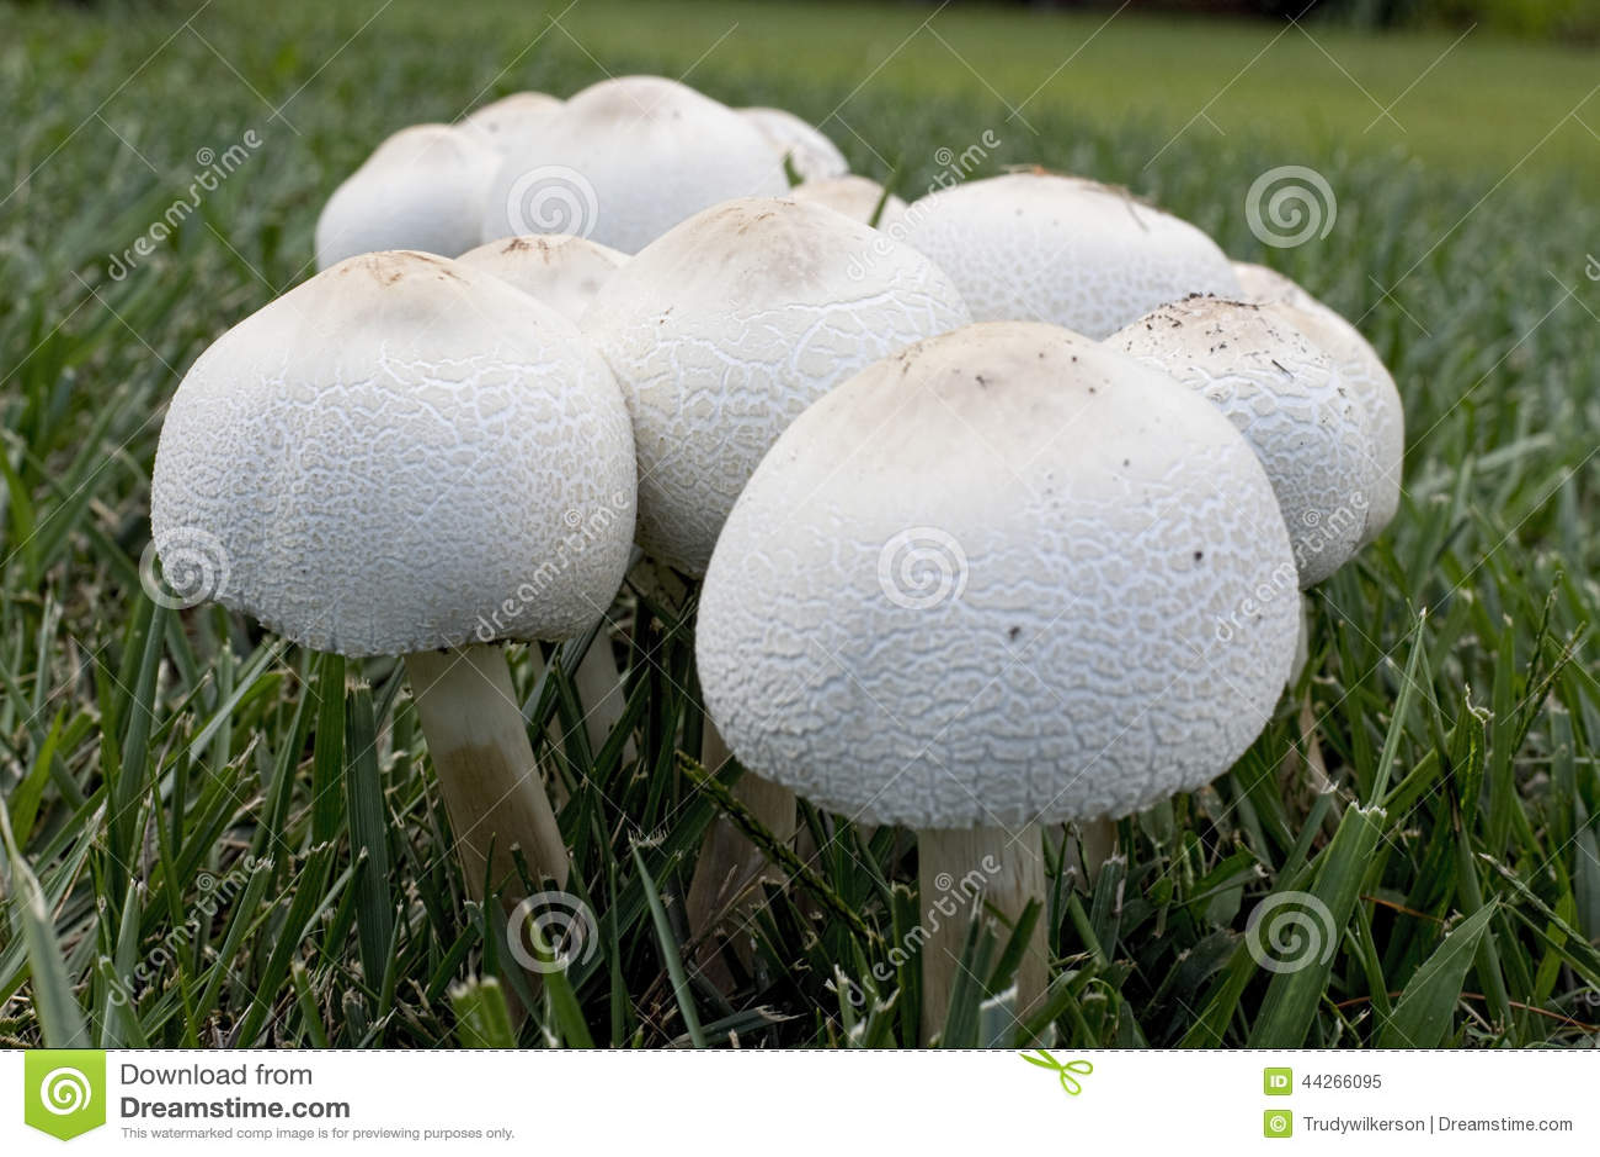 How to Become a Profitable Mushroom Grower